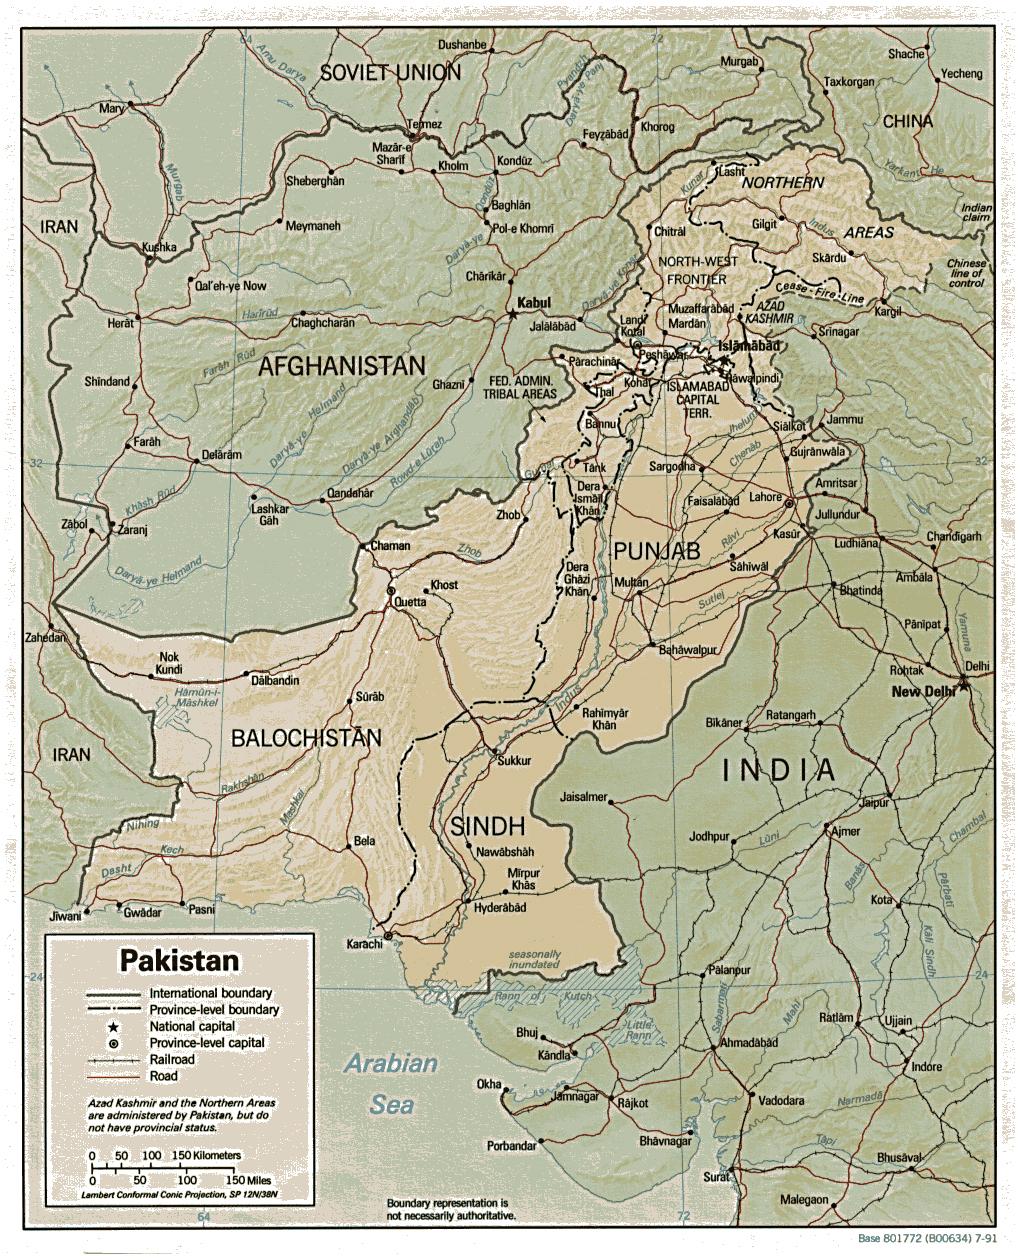 Maps Of Pakistan Detailed Map Of Pakistan In English Tourist - Maps of pakistan